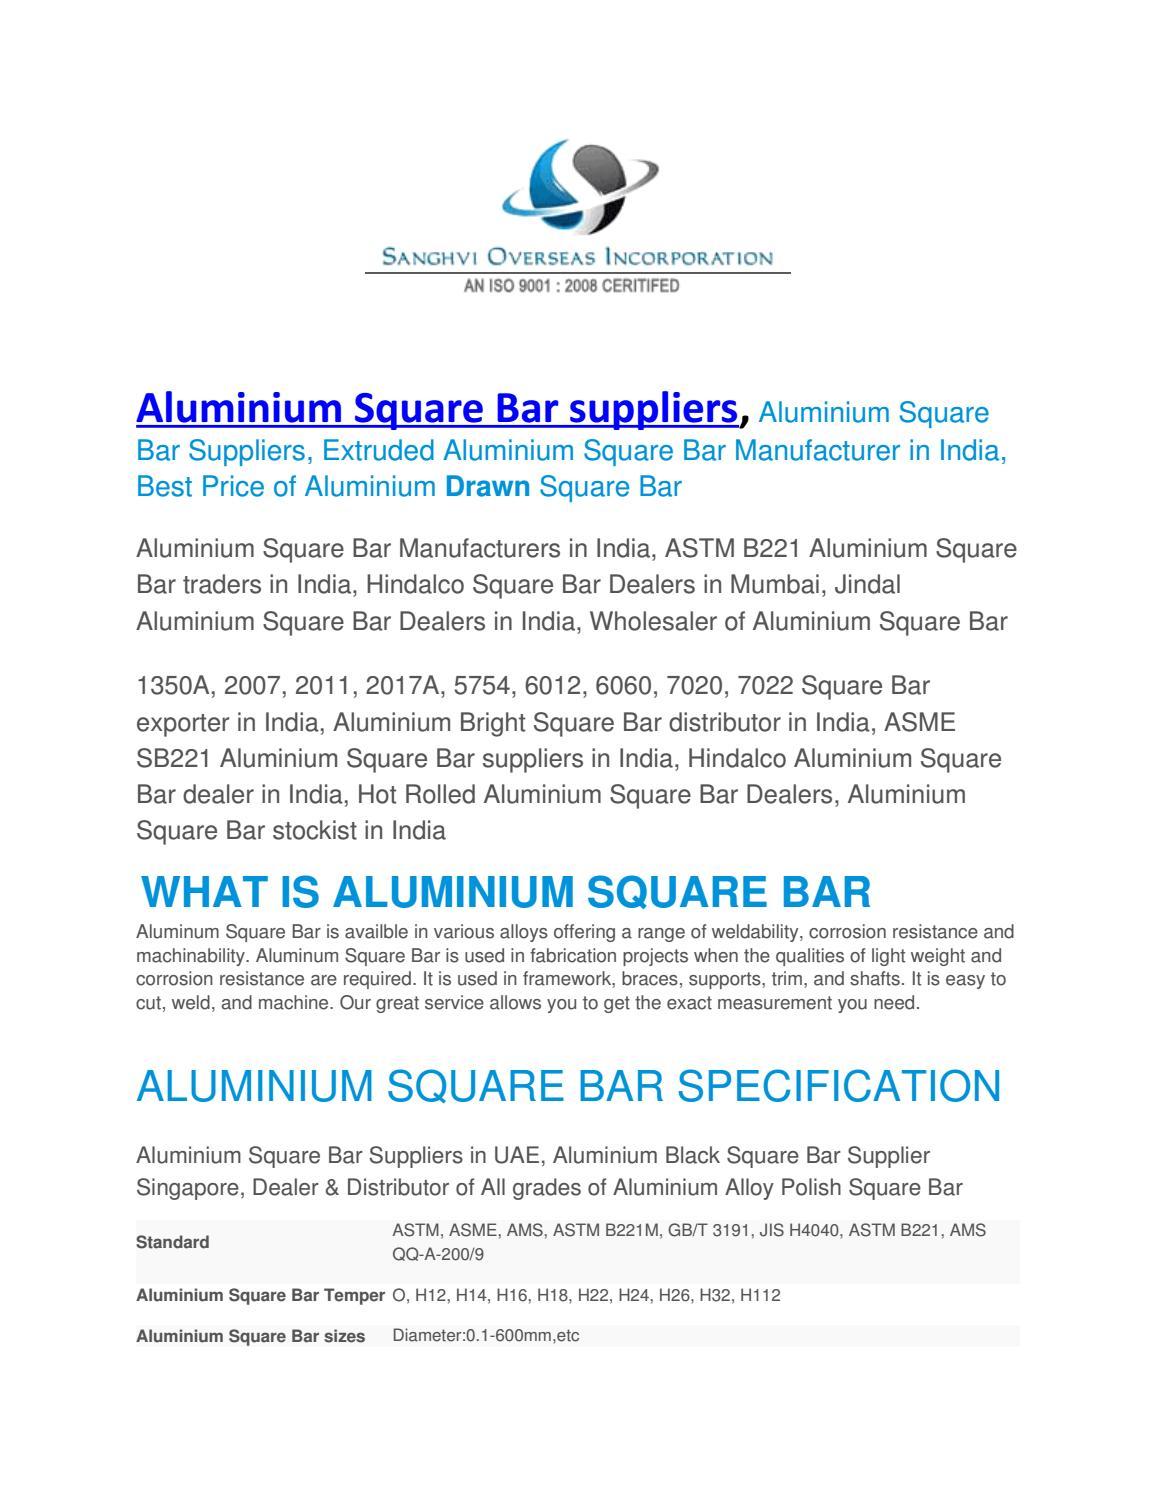 Aluminium square bar suppliers by sanghvioverseasinc - issuu